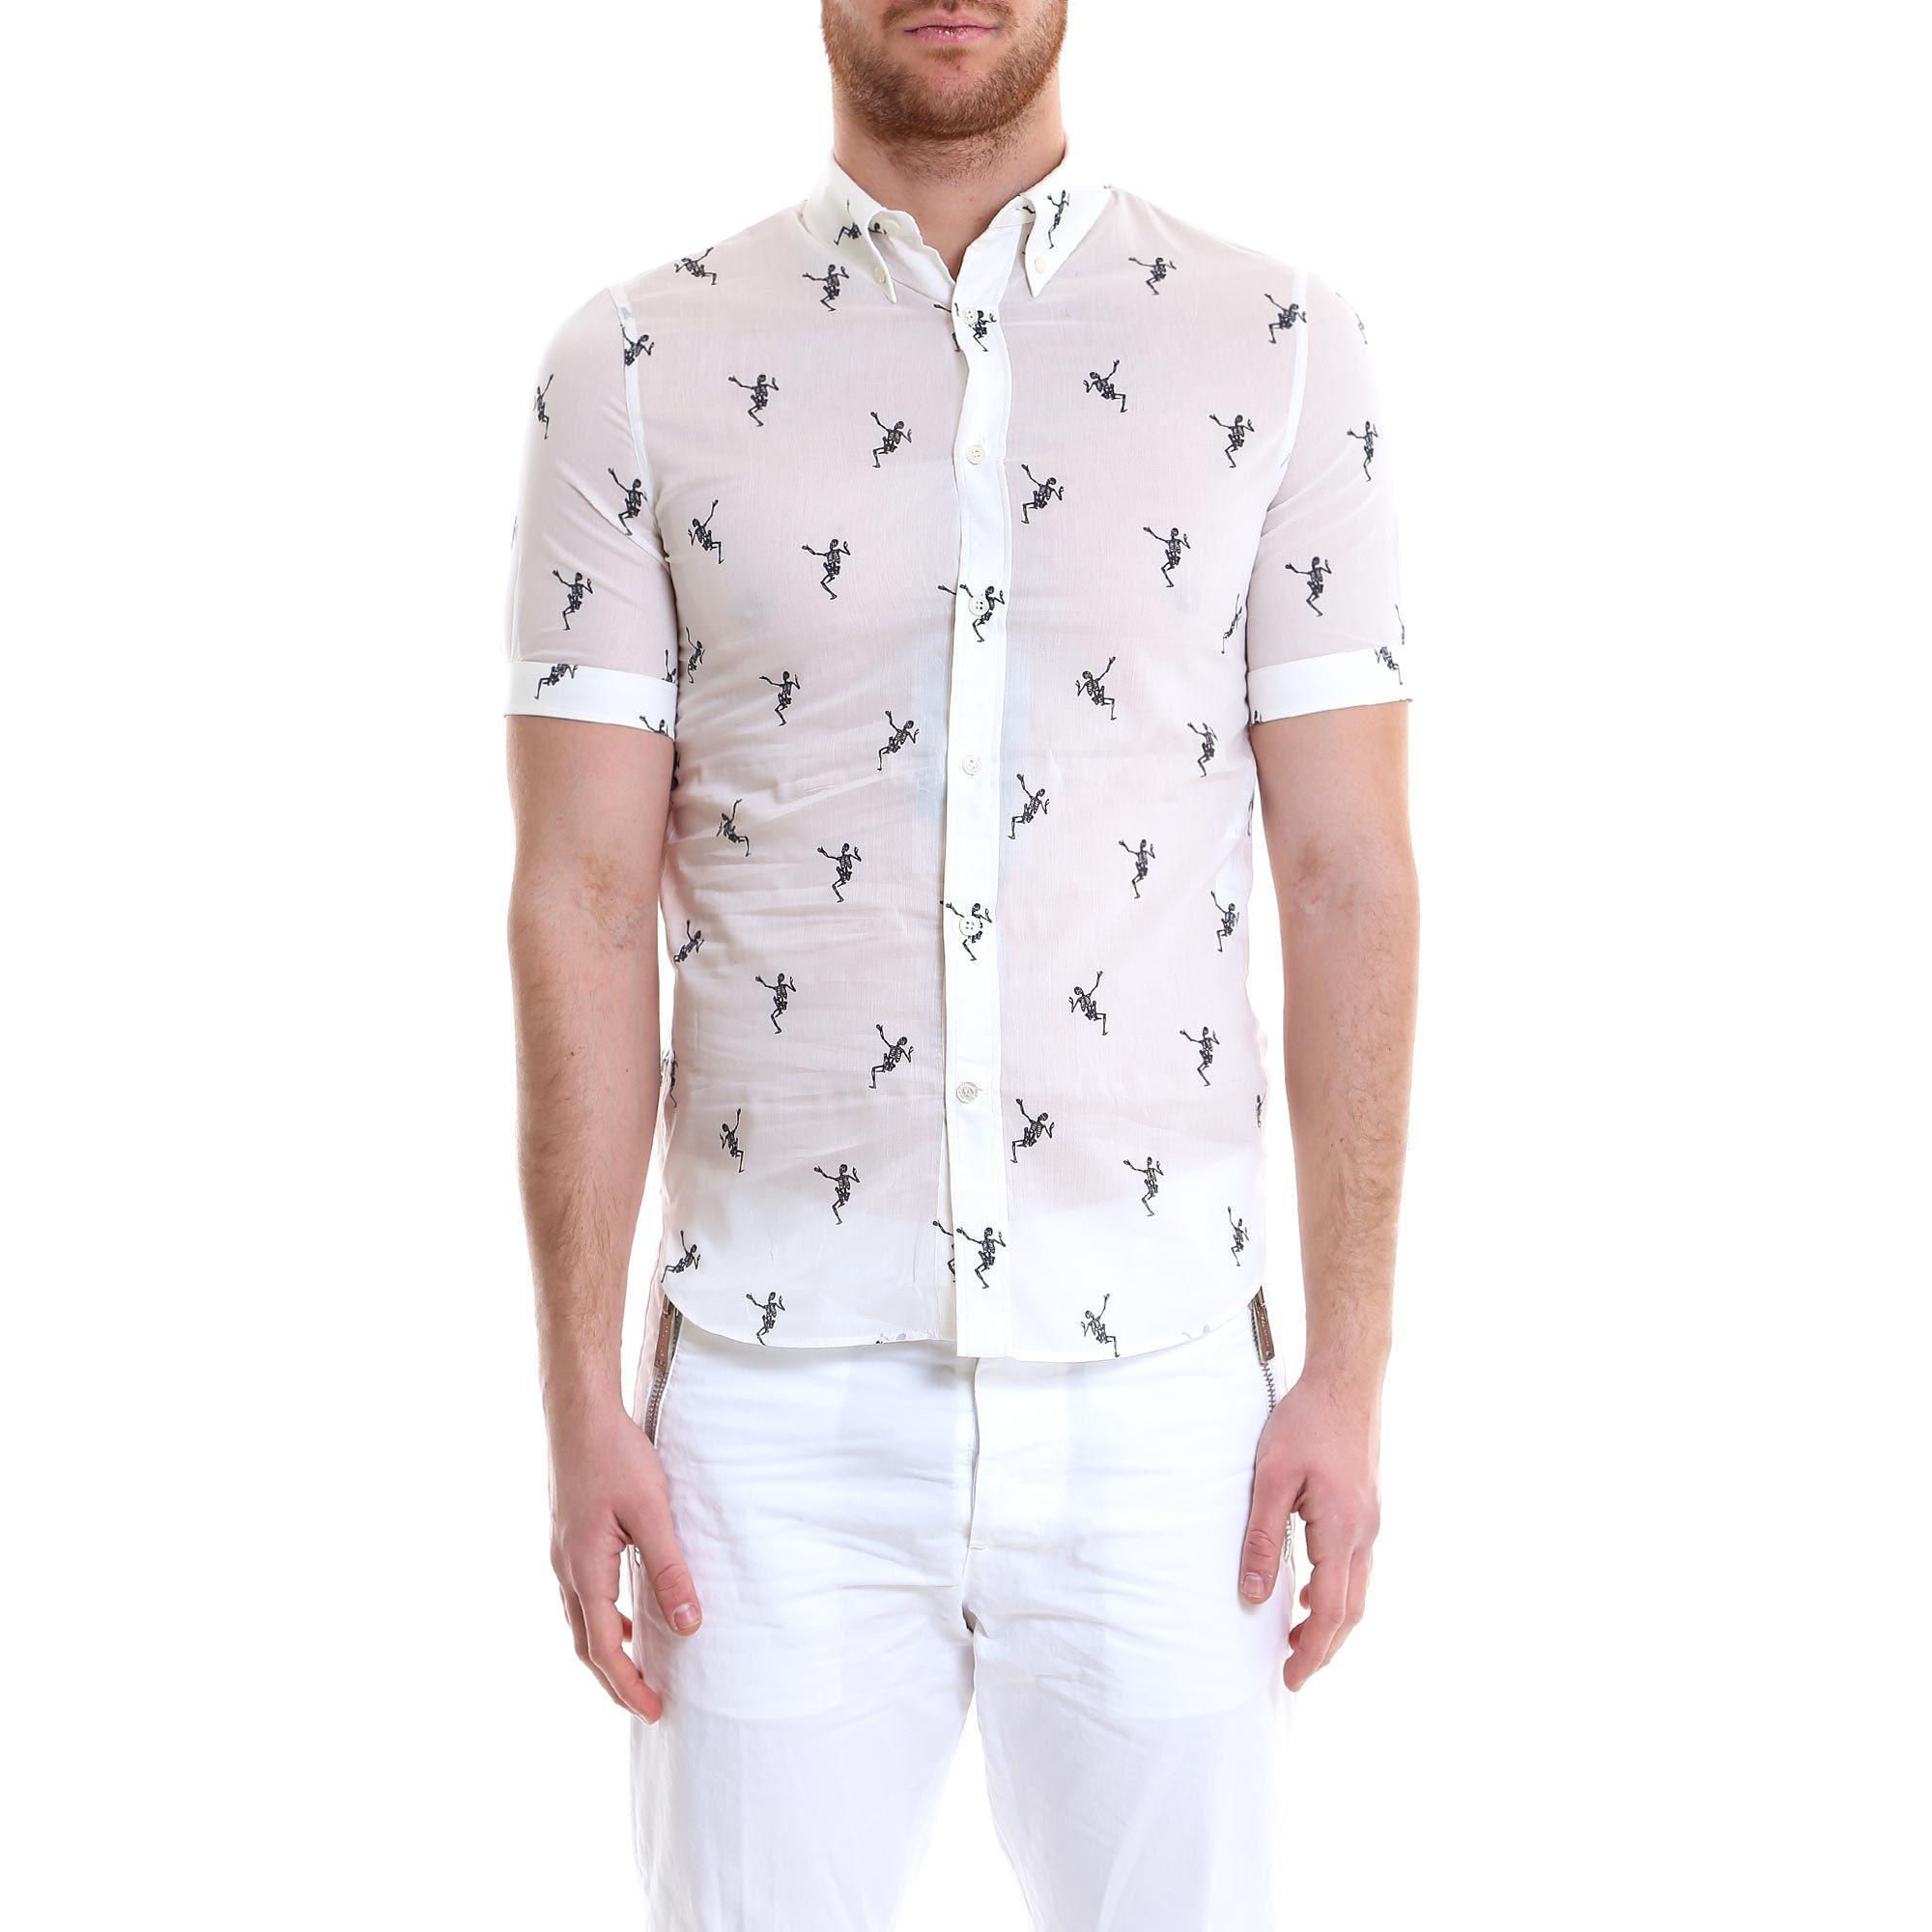 39c11d5a Alexander Mcqueen Dancing Skeleton Shirt In White | ModeSens